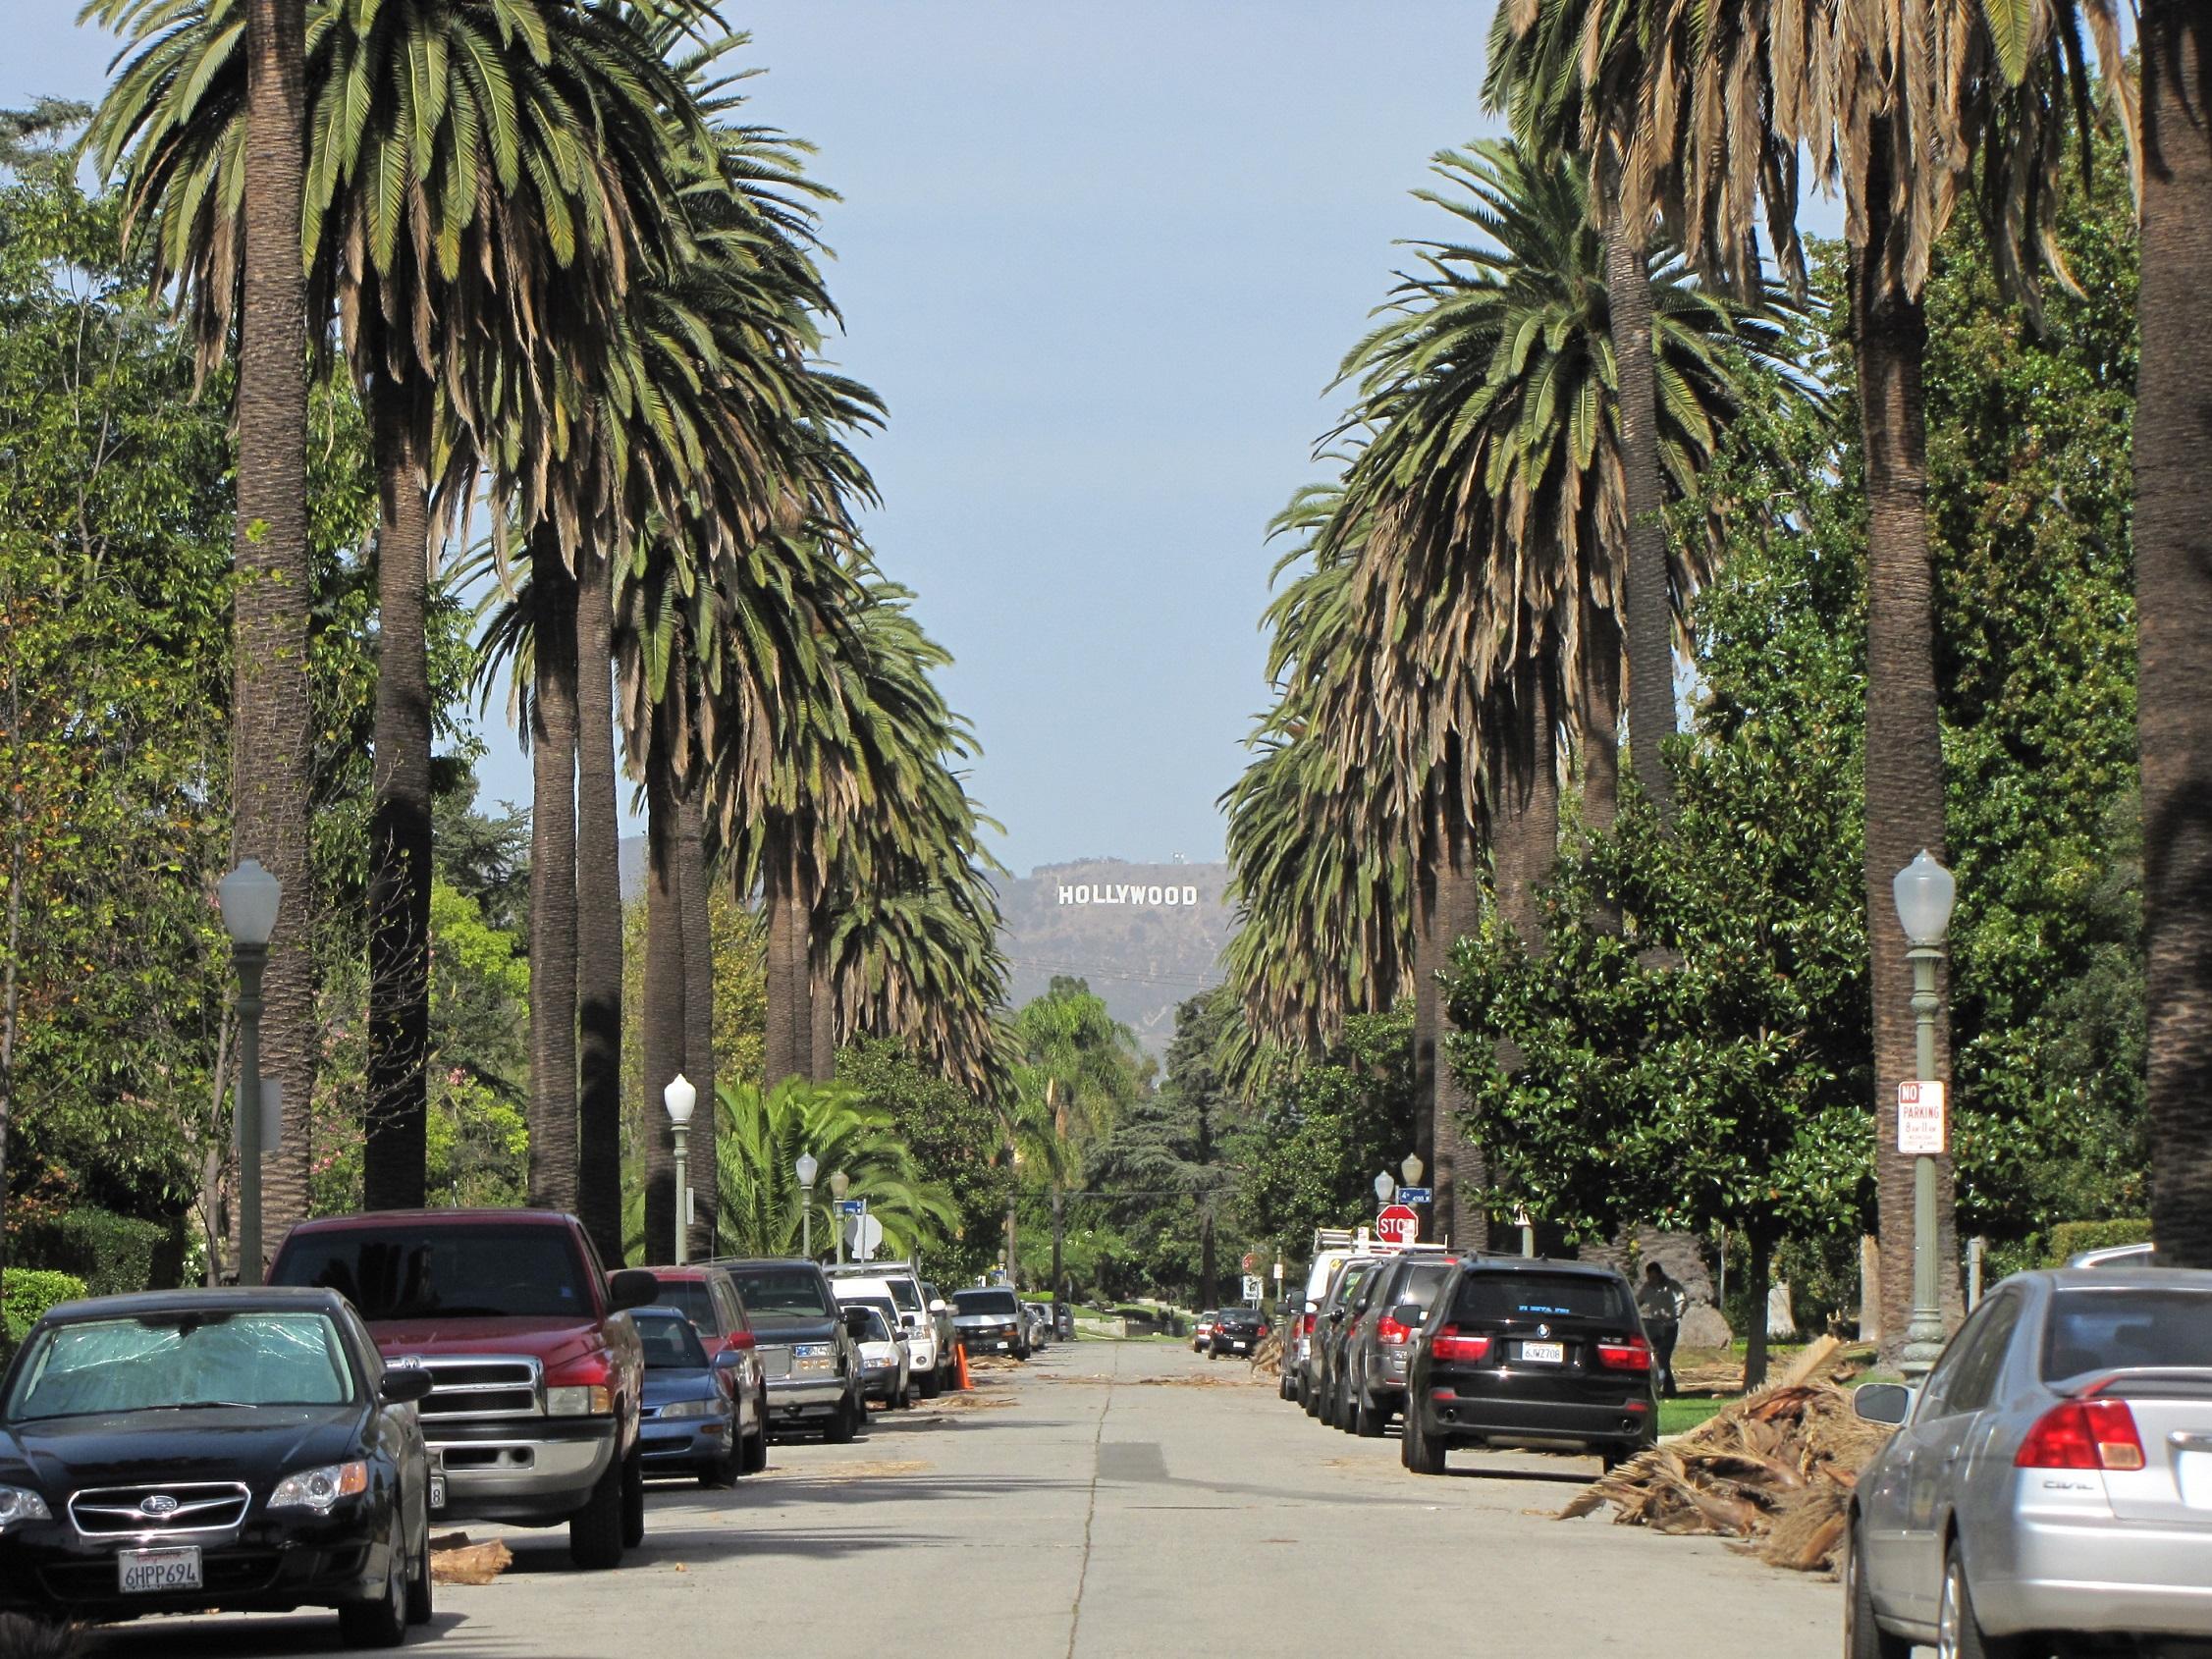 Лос-Анджелес - Гранд тур - 8 часов